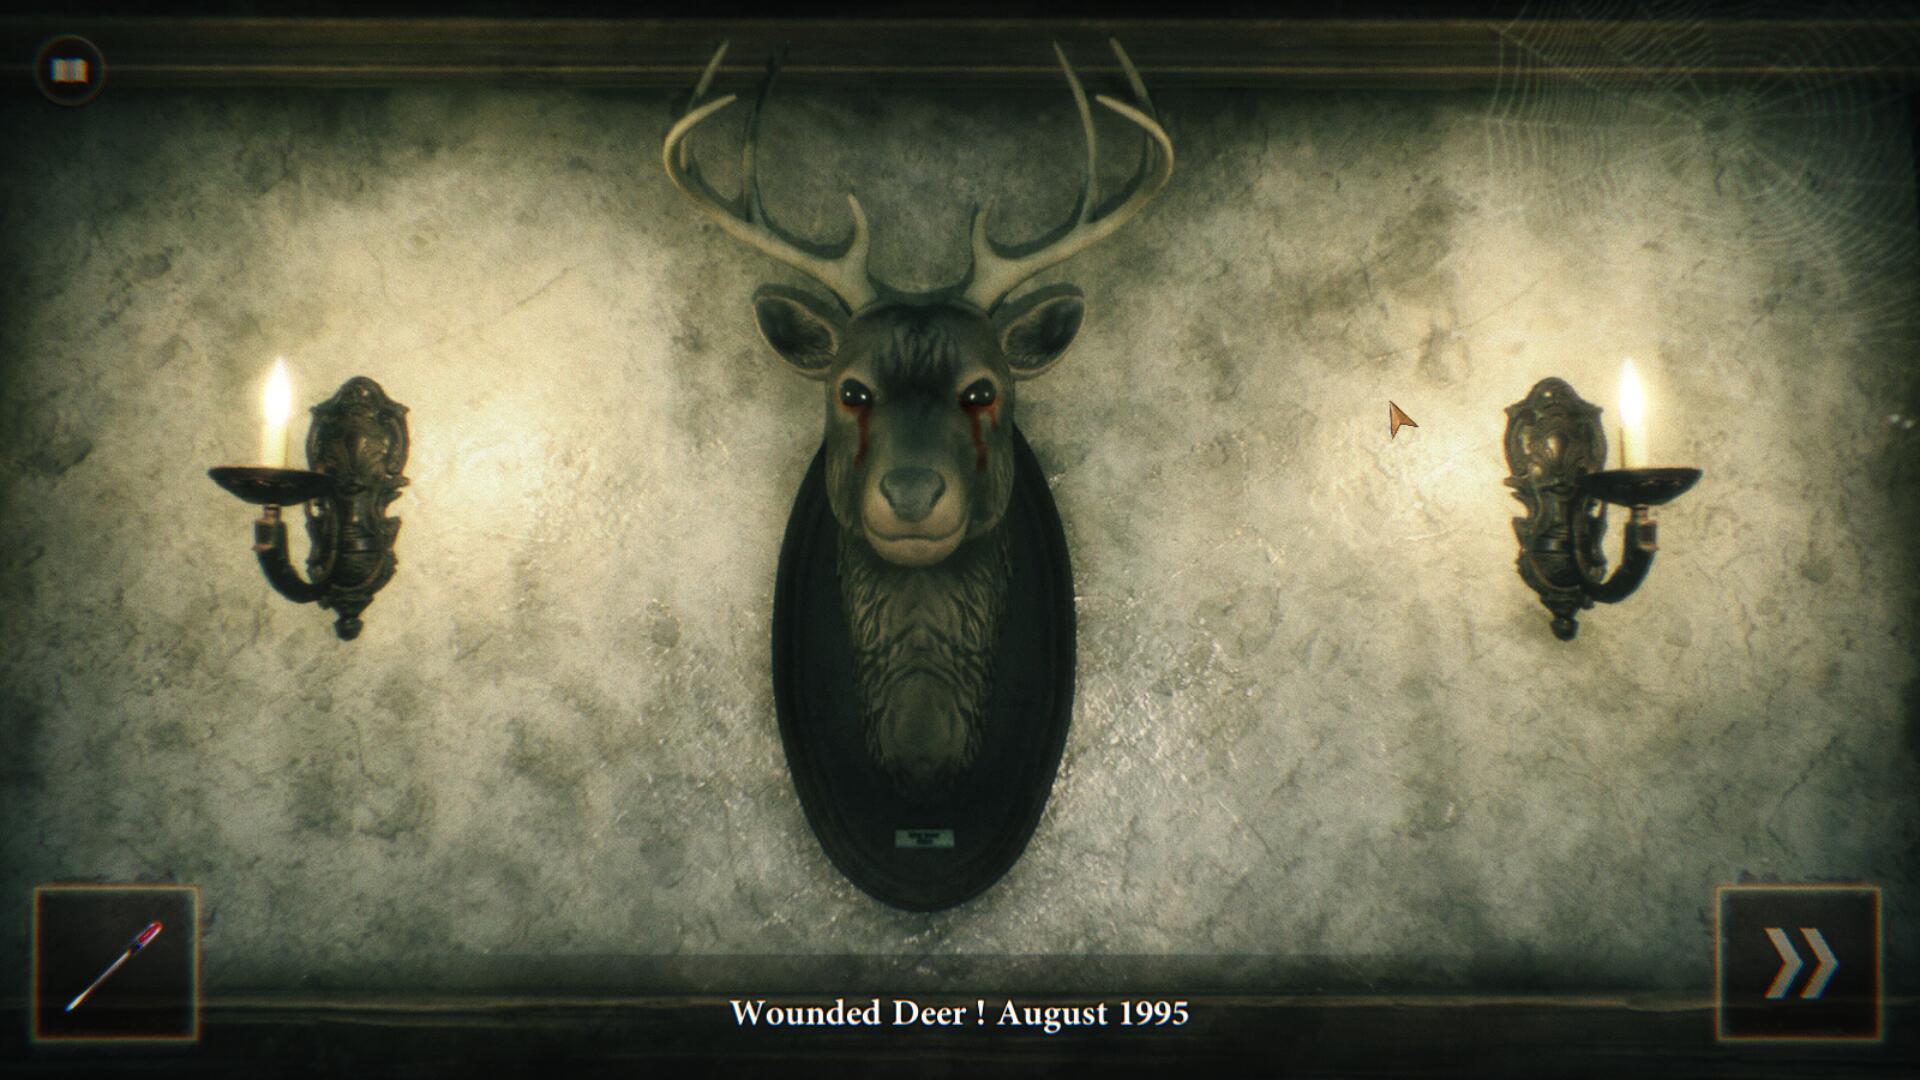 Darkroom游戏攻略 暗室困难难度第一章